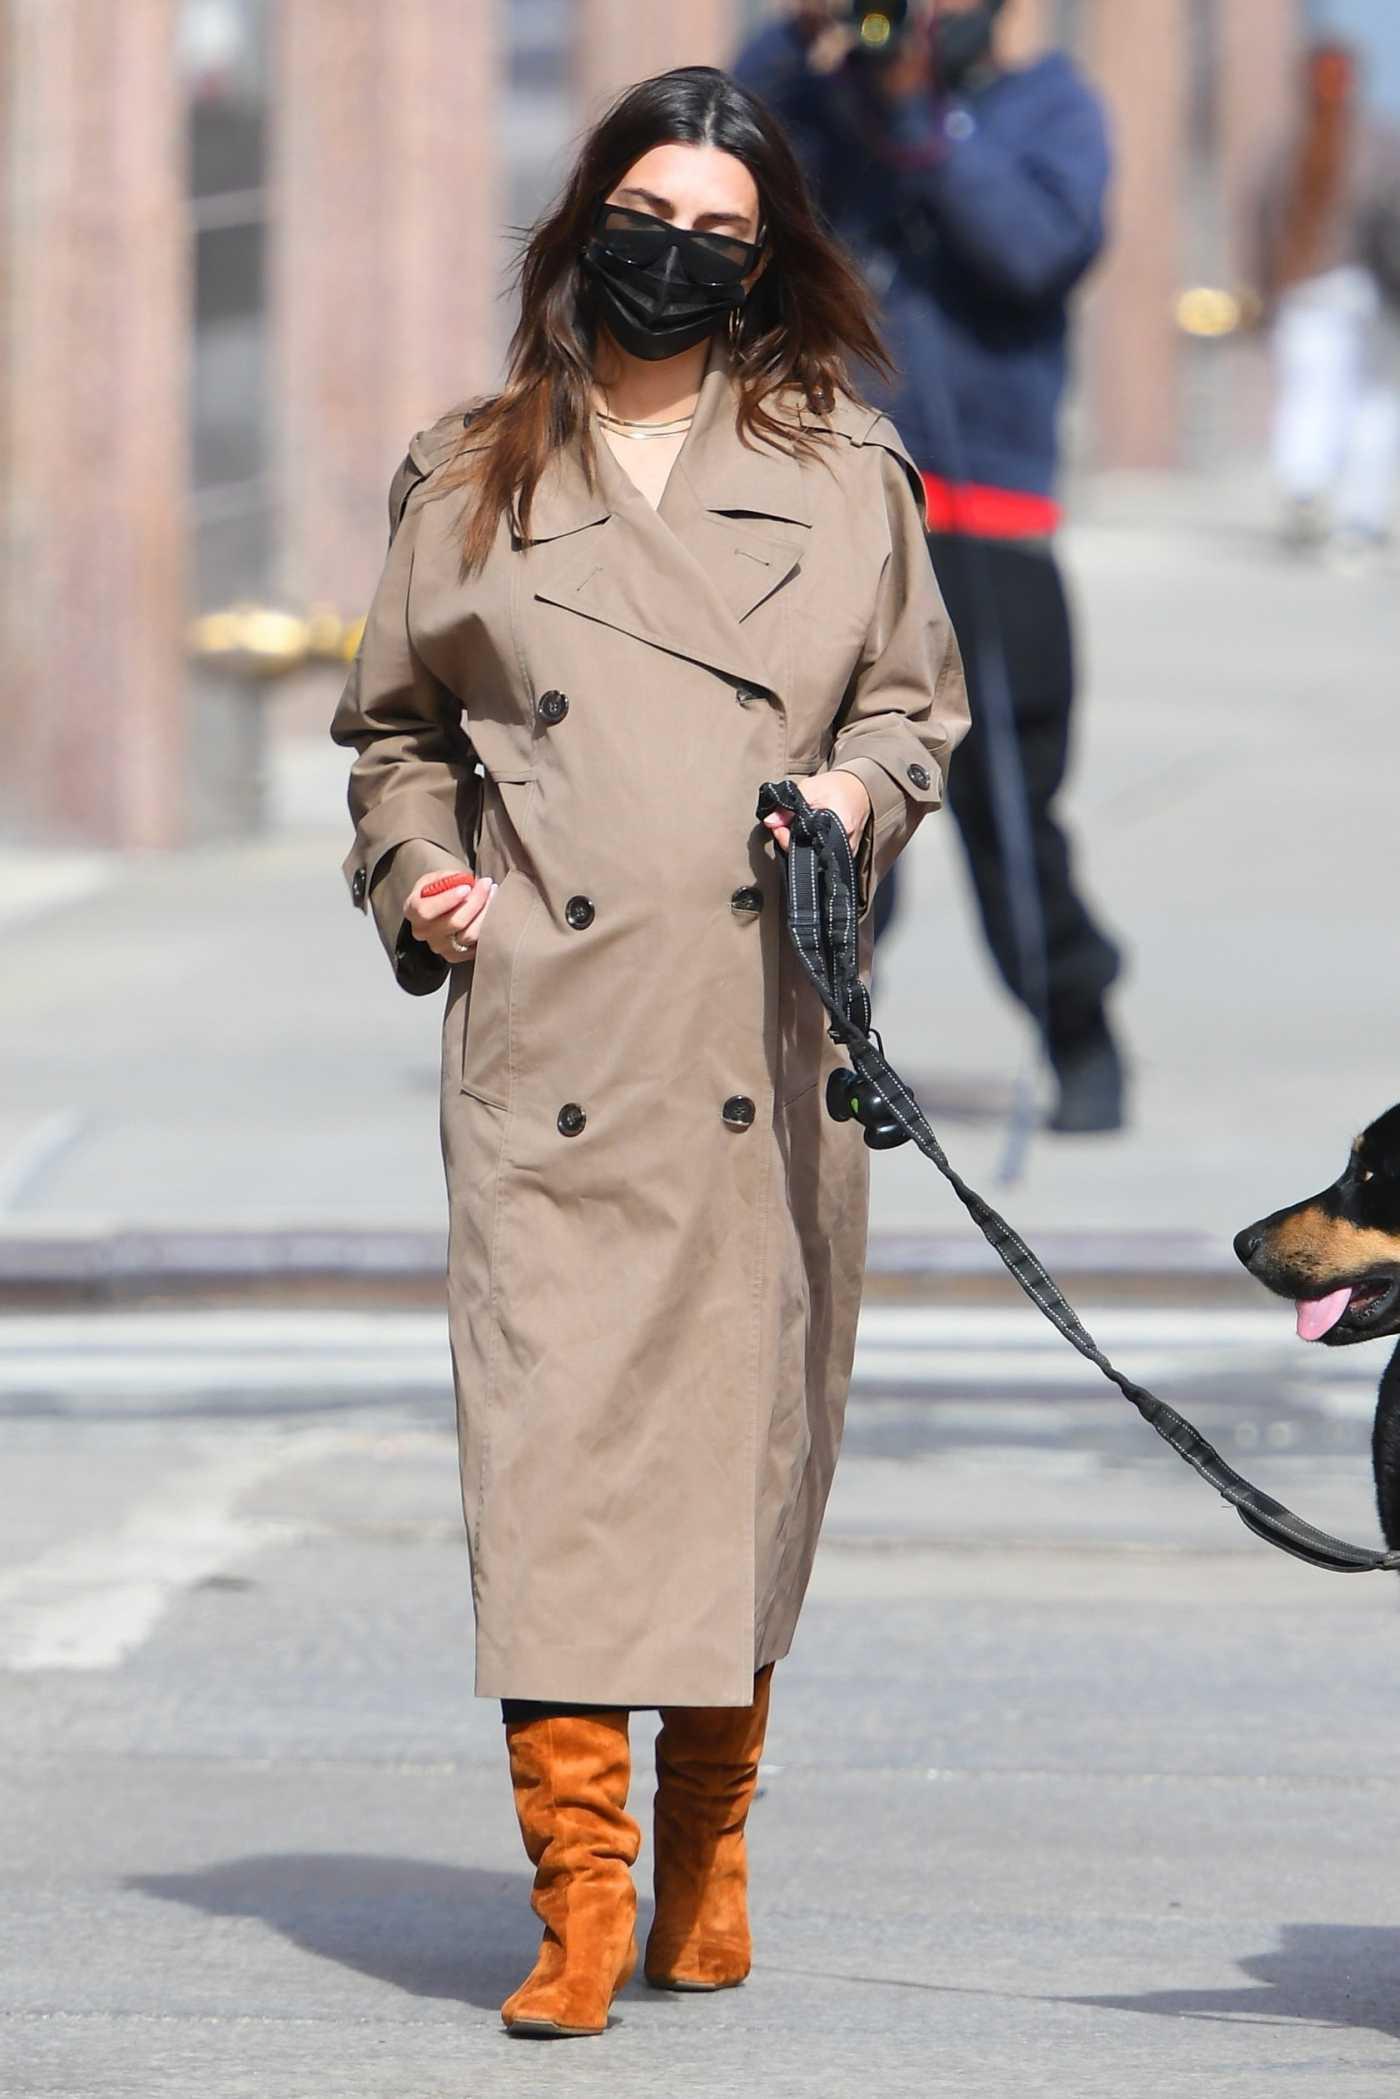 Emily Ratajkowski in a Beige Trench Coat Walks Her Dog Colombo in New York 02/26/2021